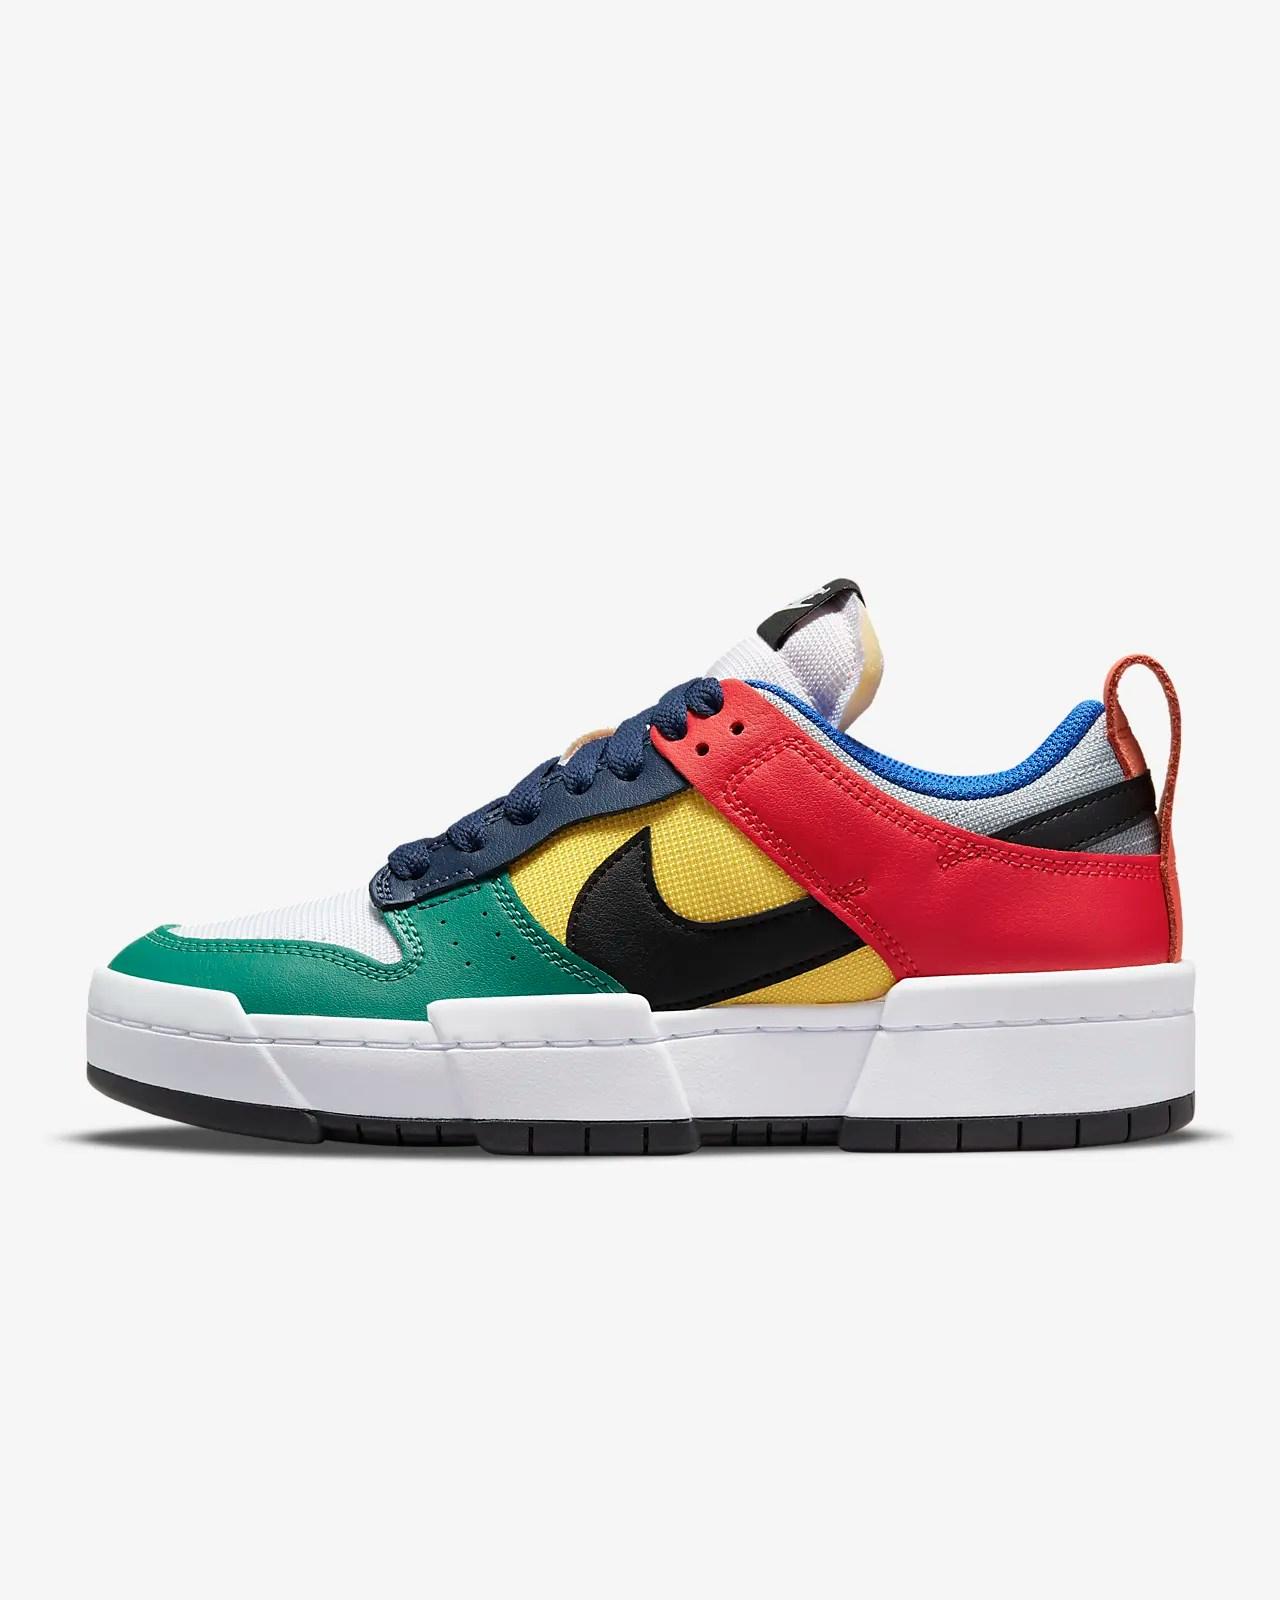 Nike Dunk Low Disrupt Women's Shoe